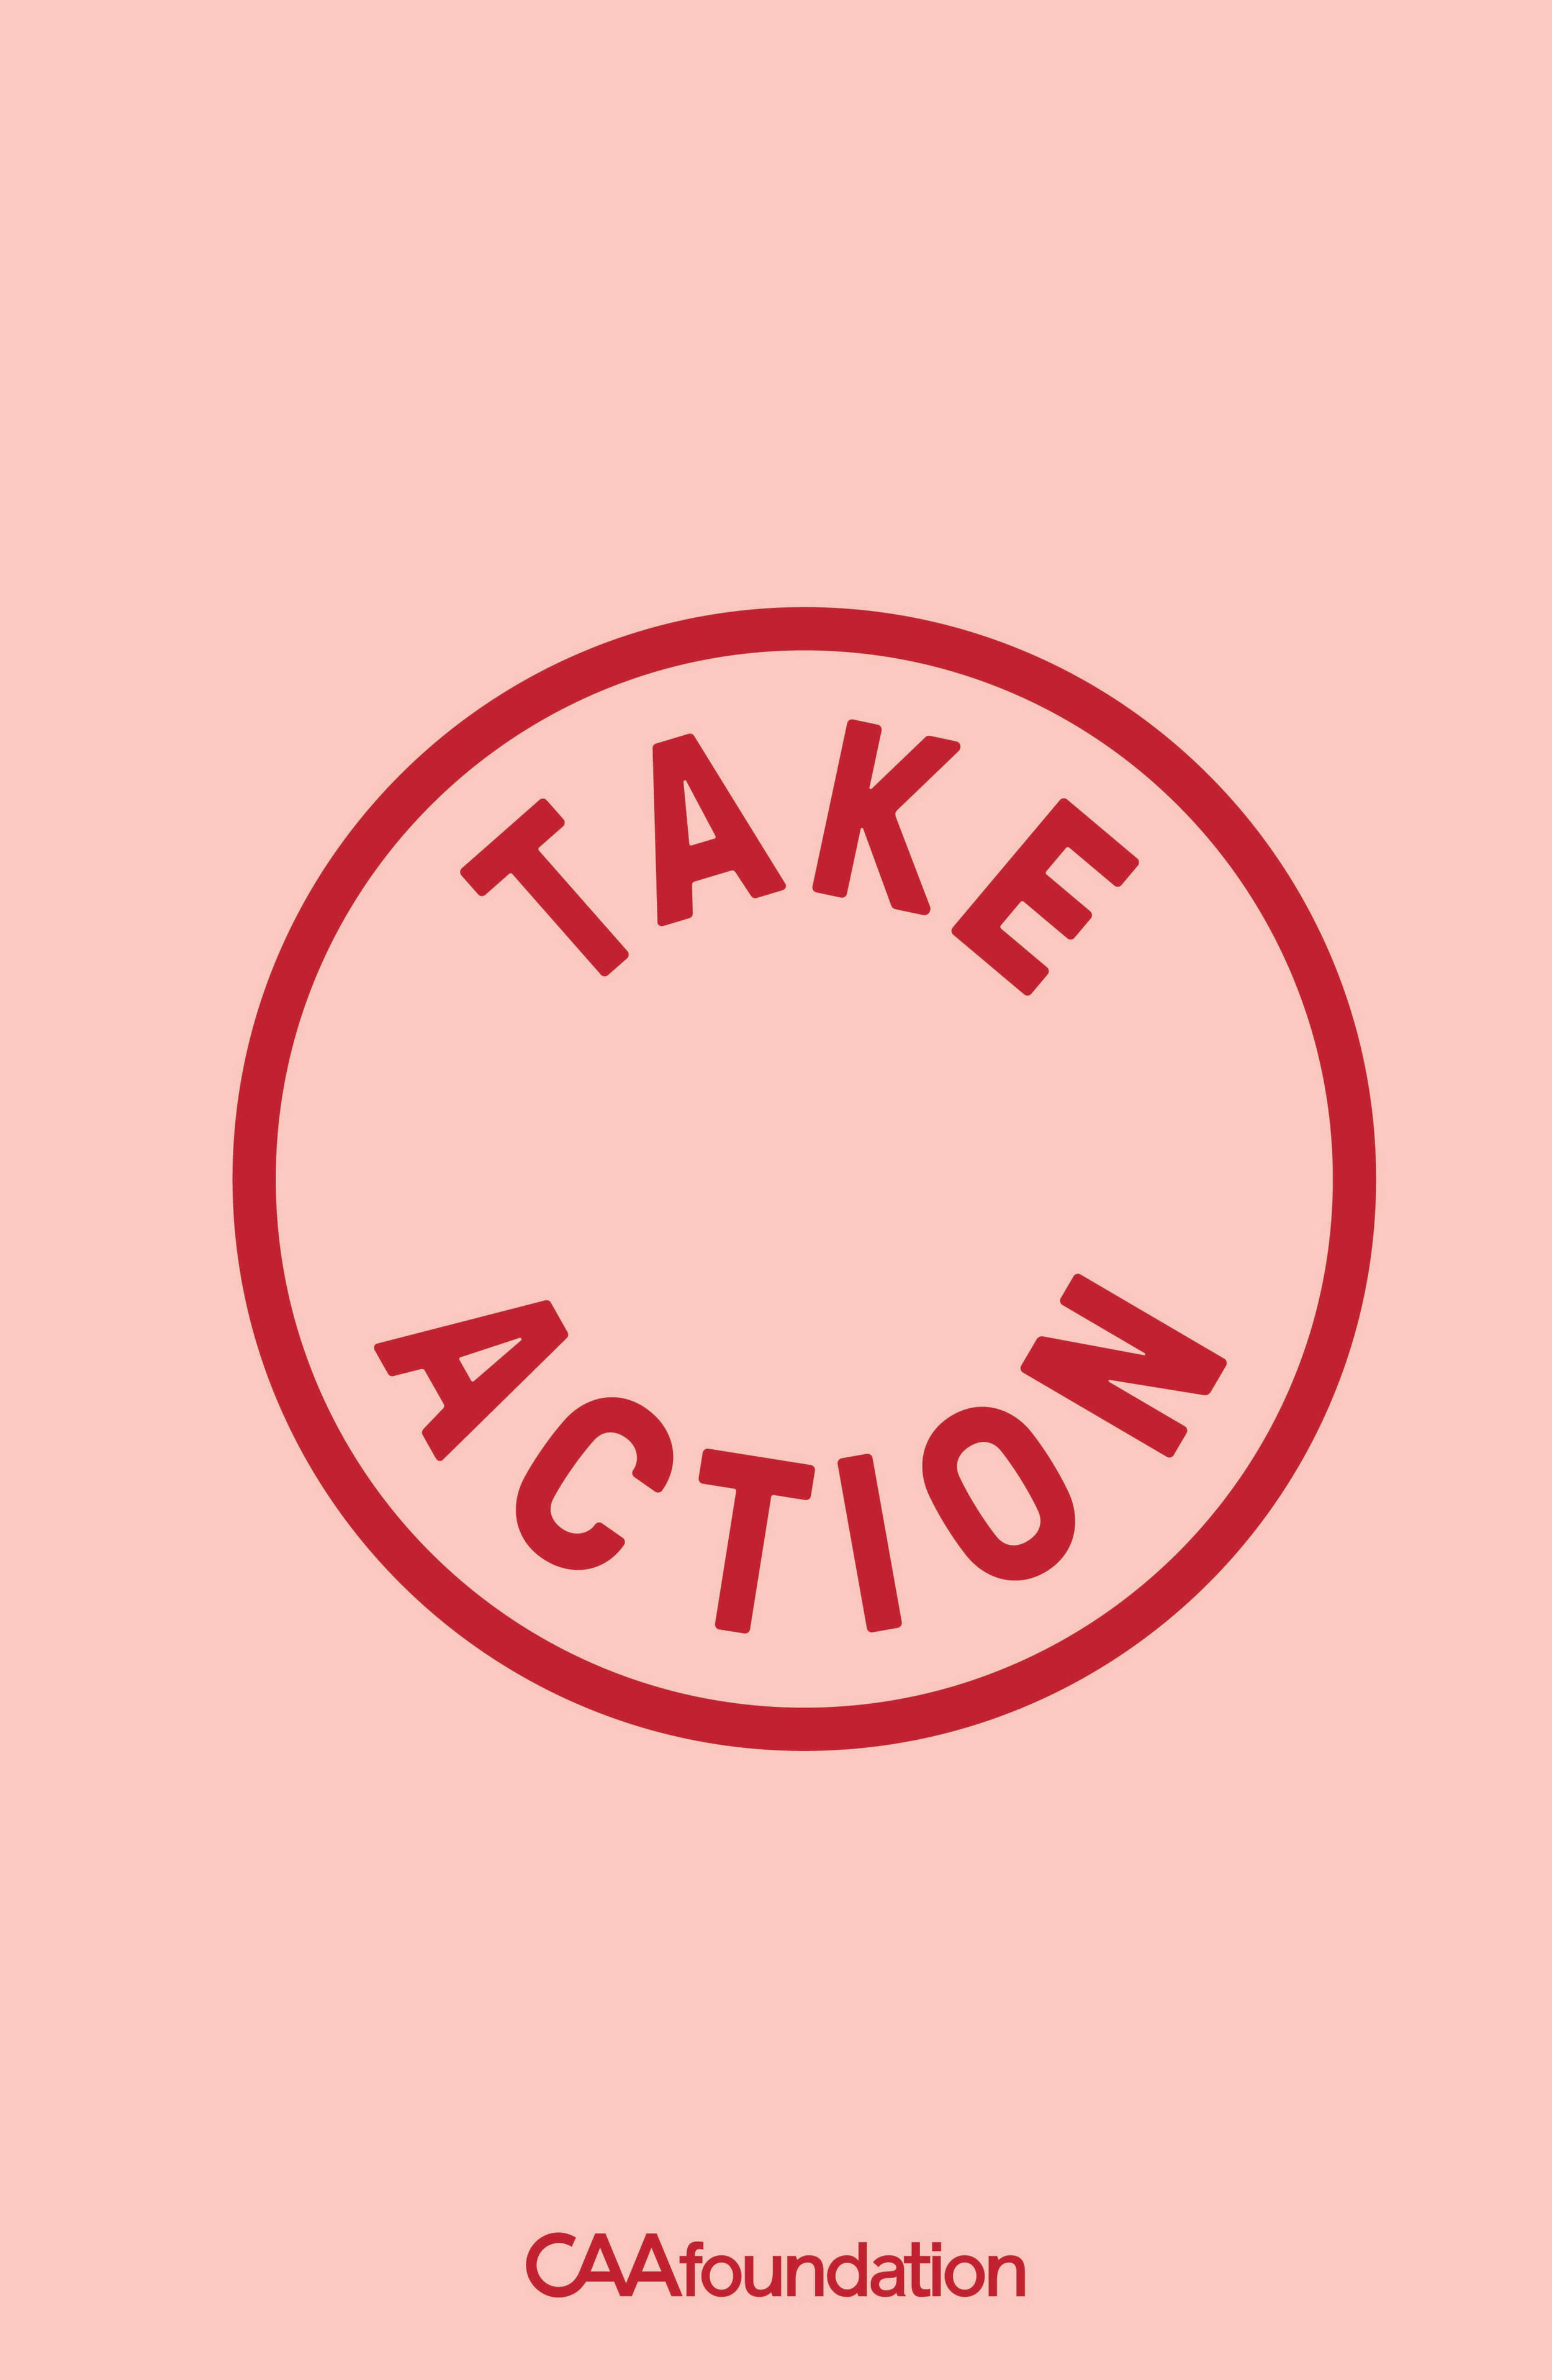 Take_Action_Posters_v5-19.jpg